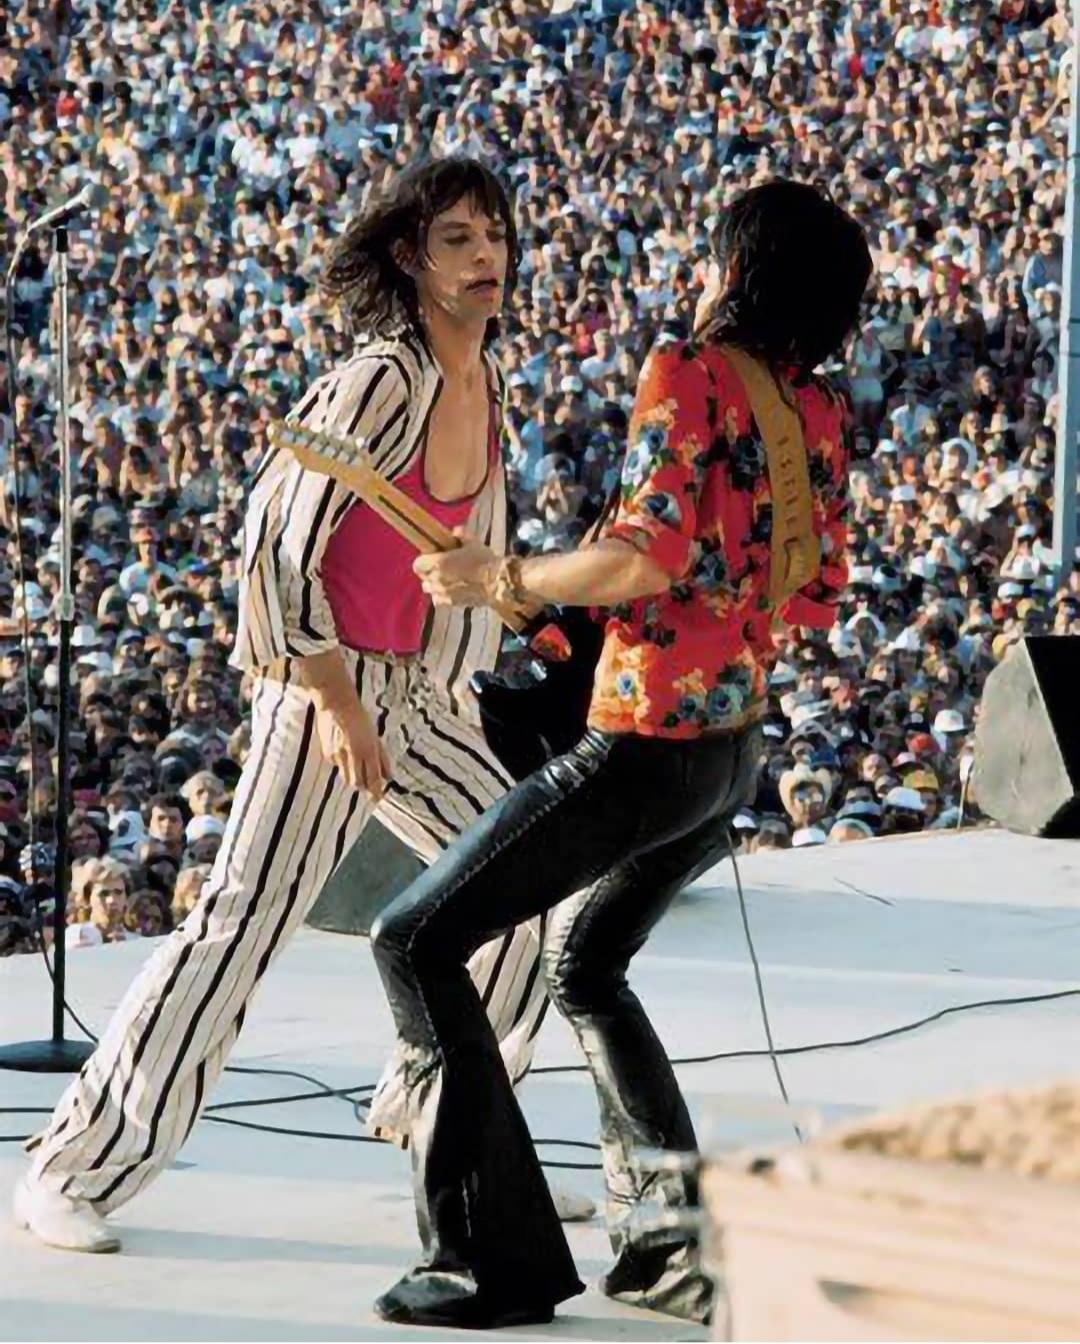 Mick & Keith american tour 1975